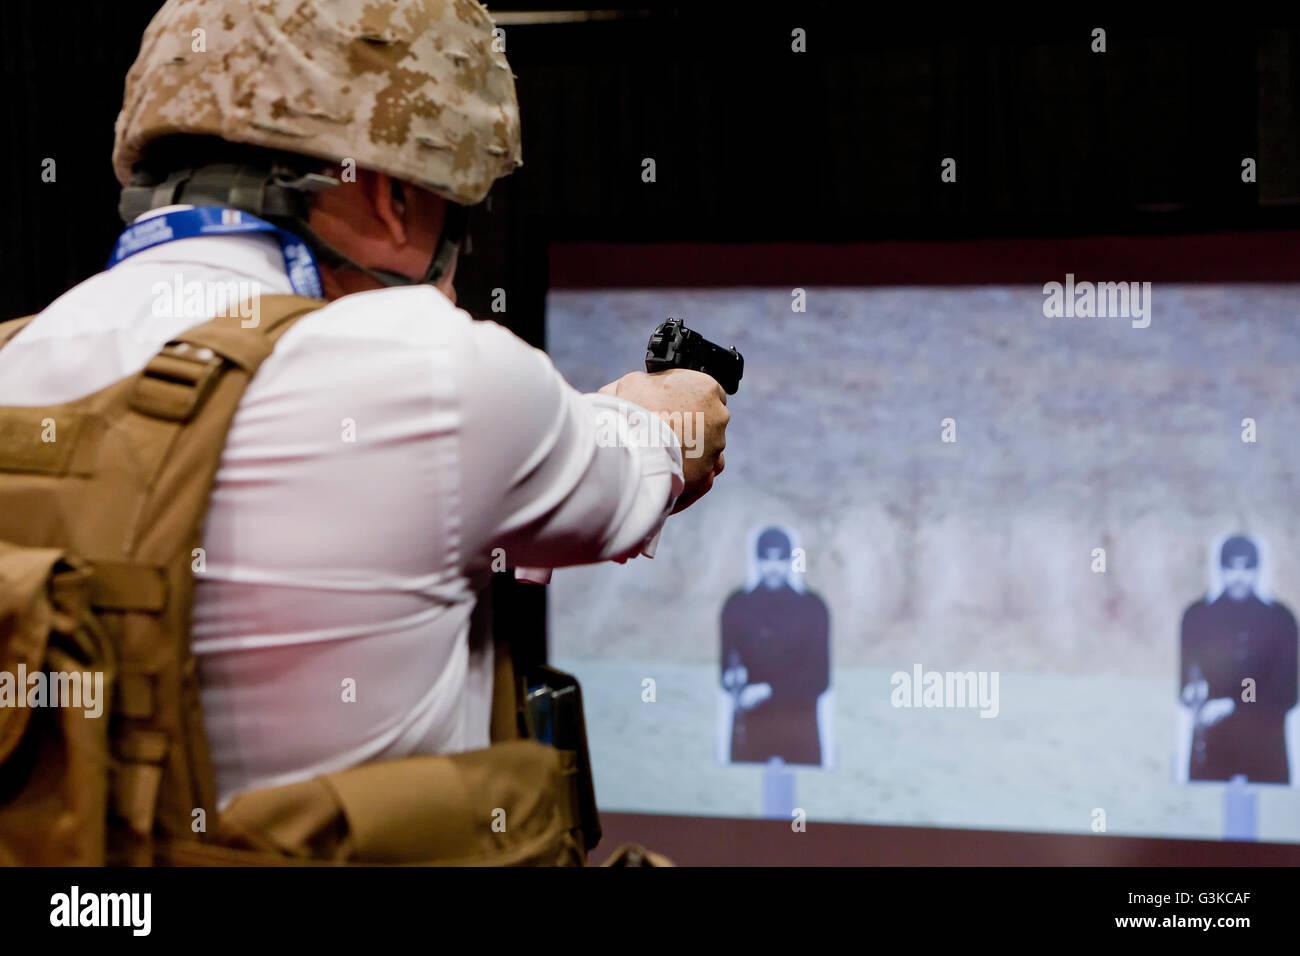 Man at a target shooting simulator using a handgun - USA - Stock Image